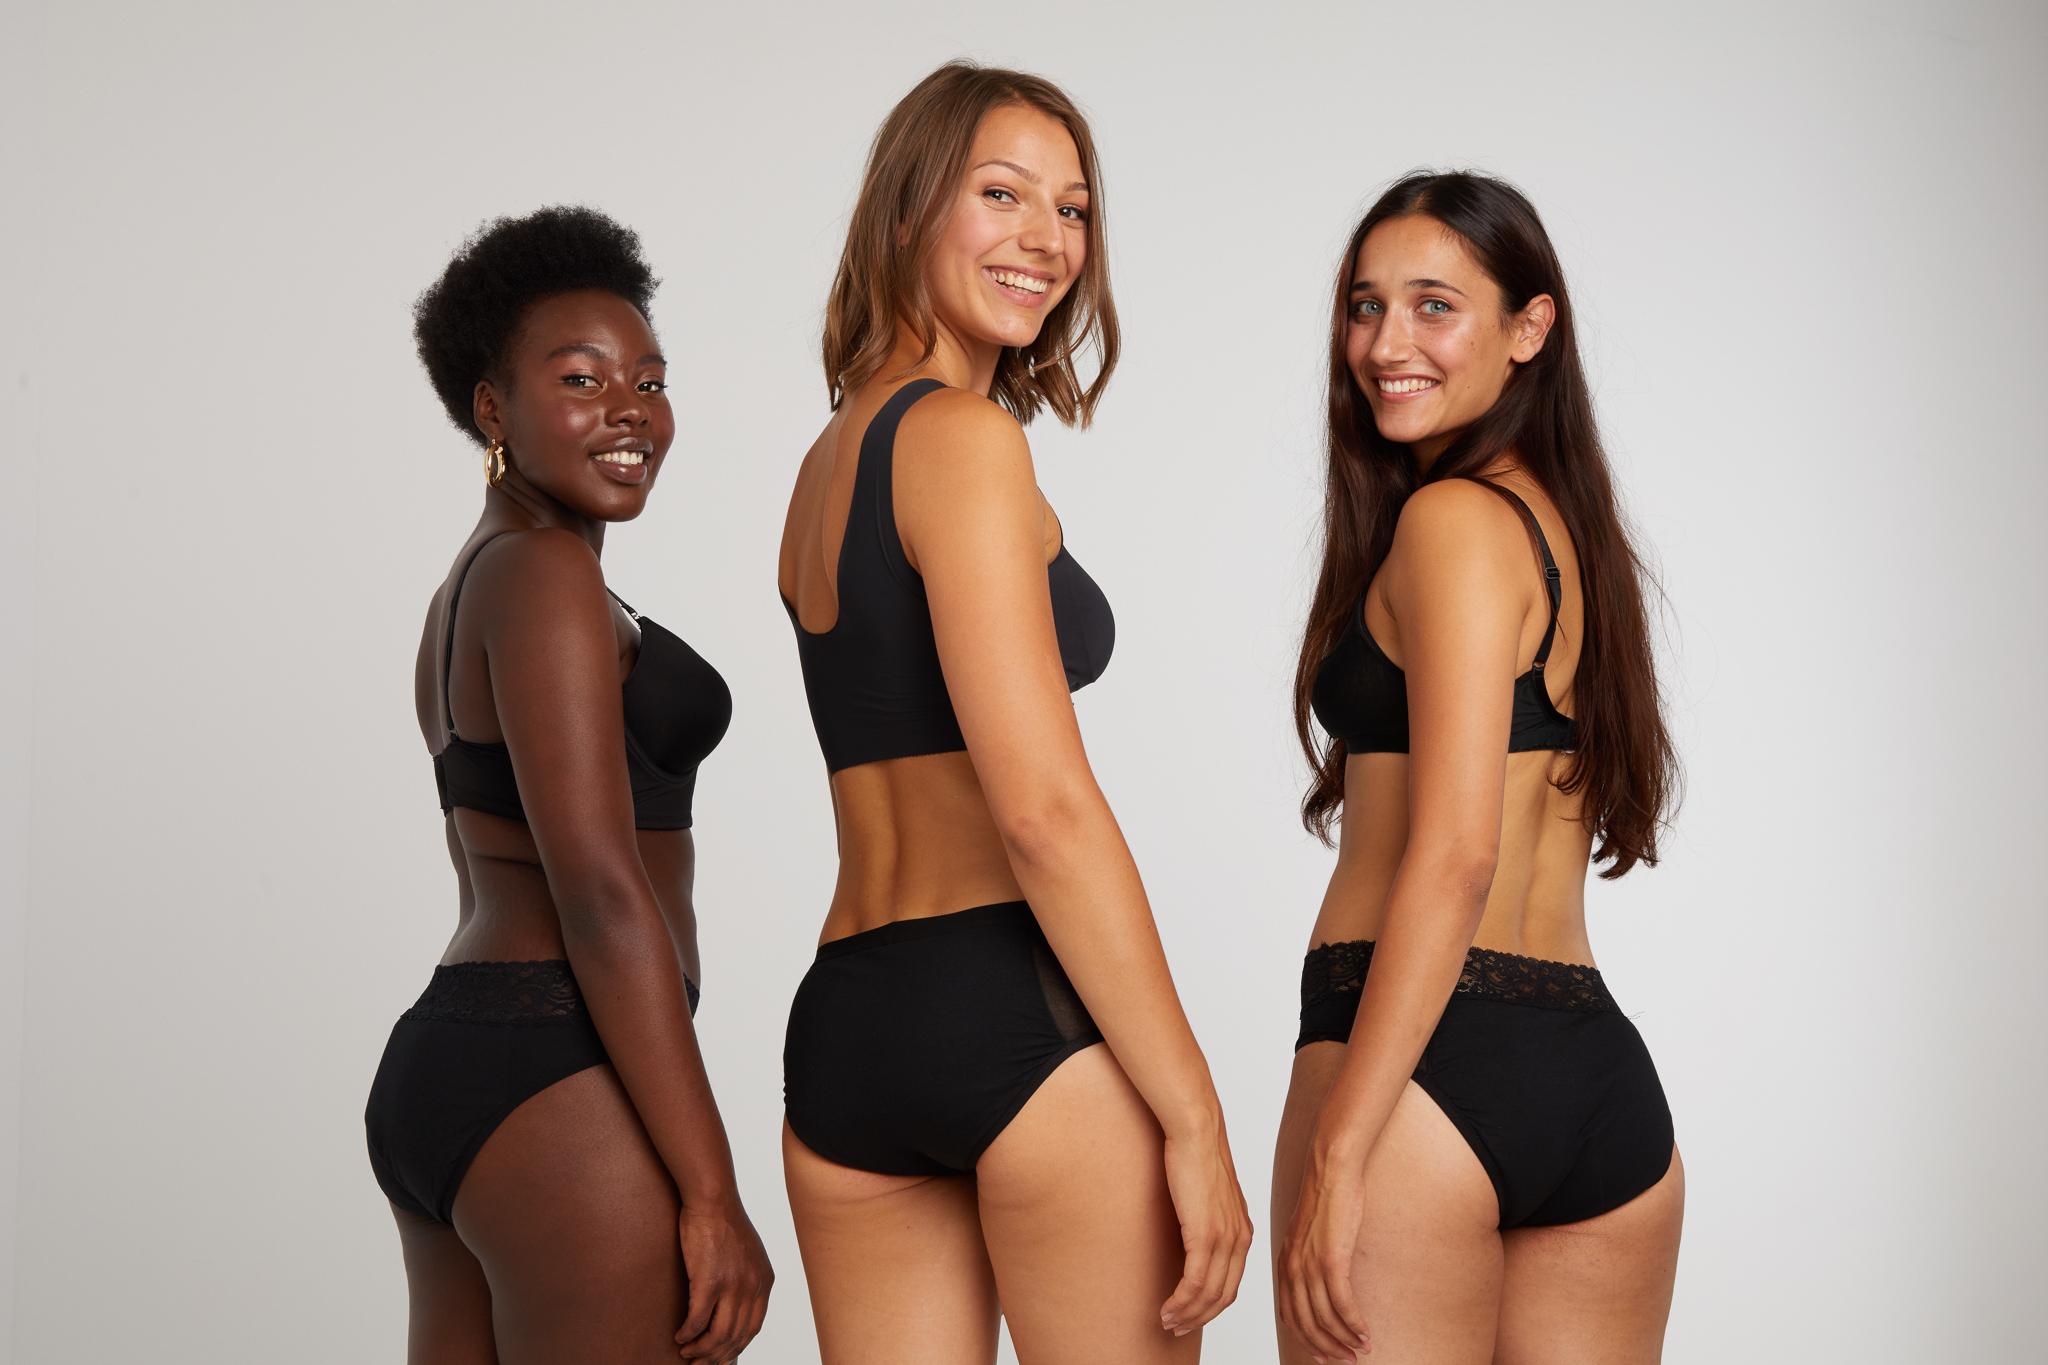 ooshi alle Models Studio Amazonen with period underwear